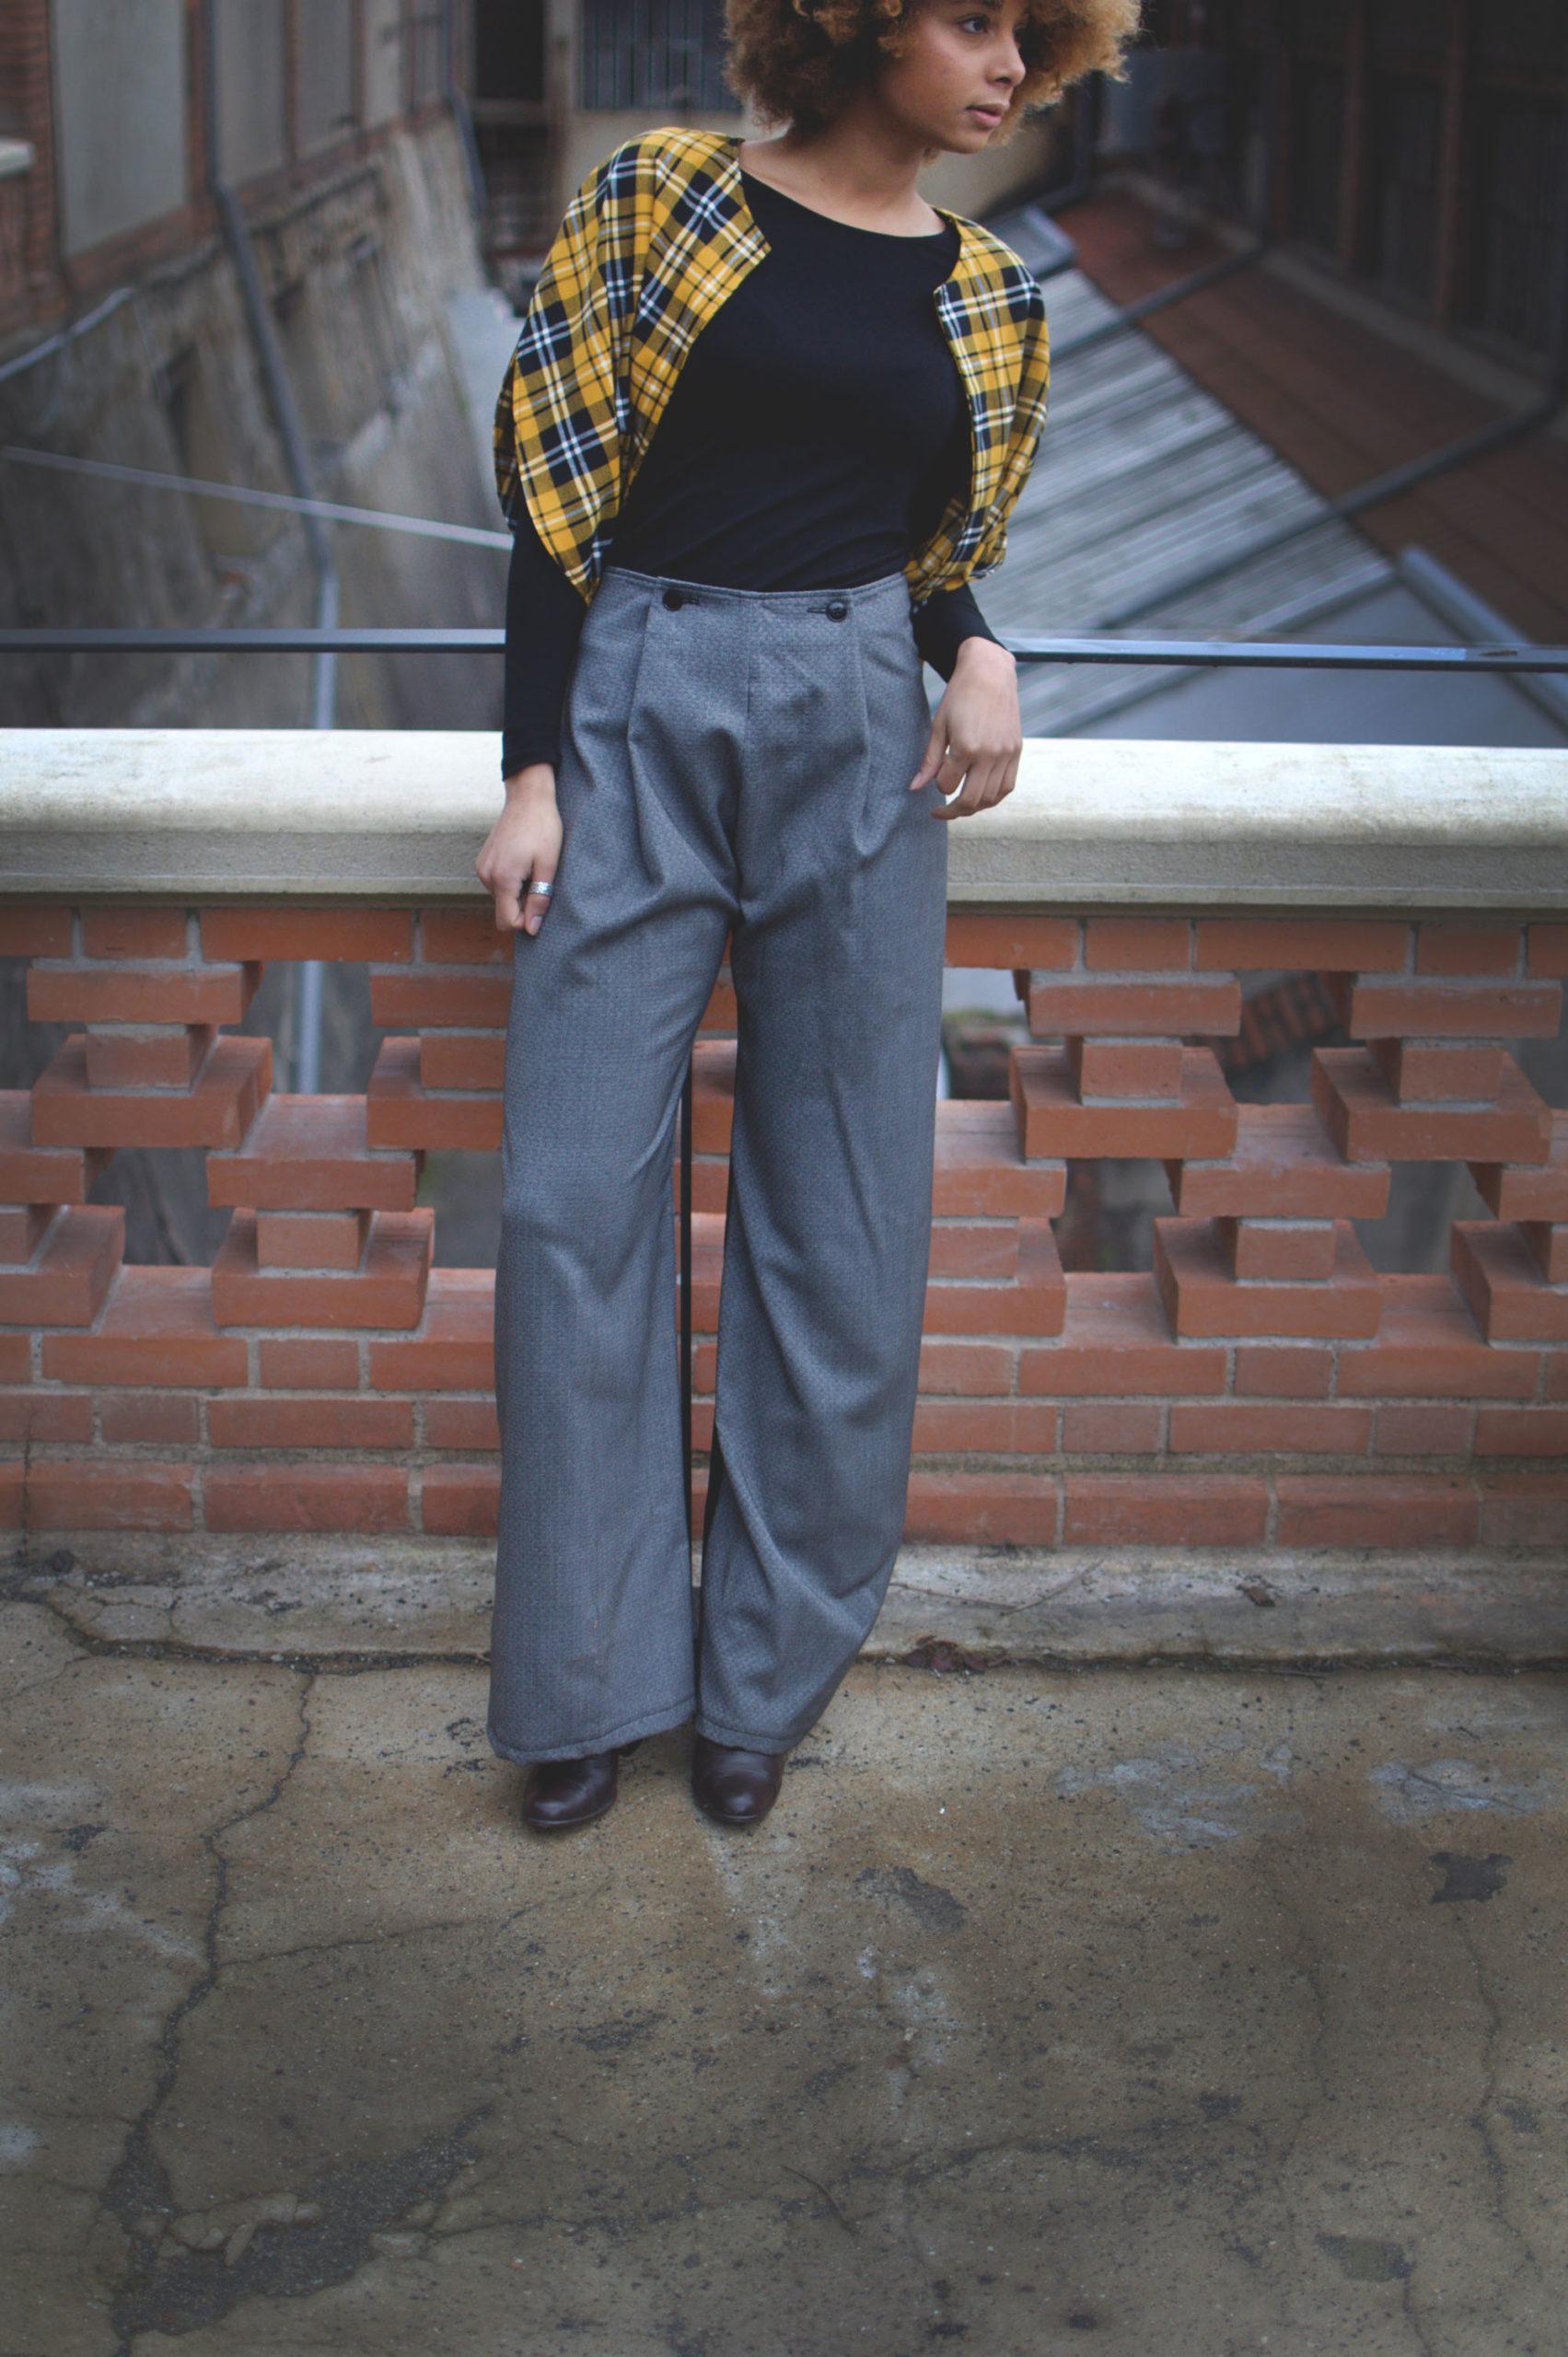 Veste et pantalon Who_Men